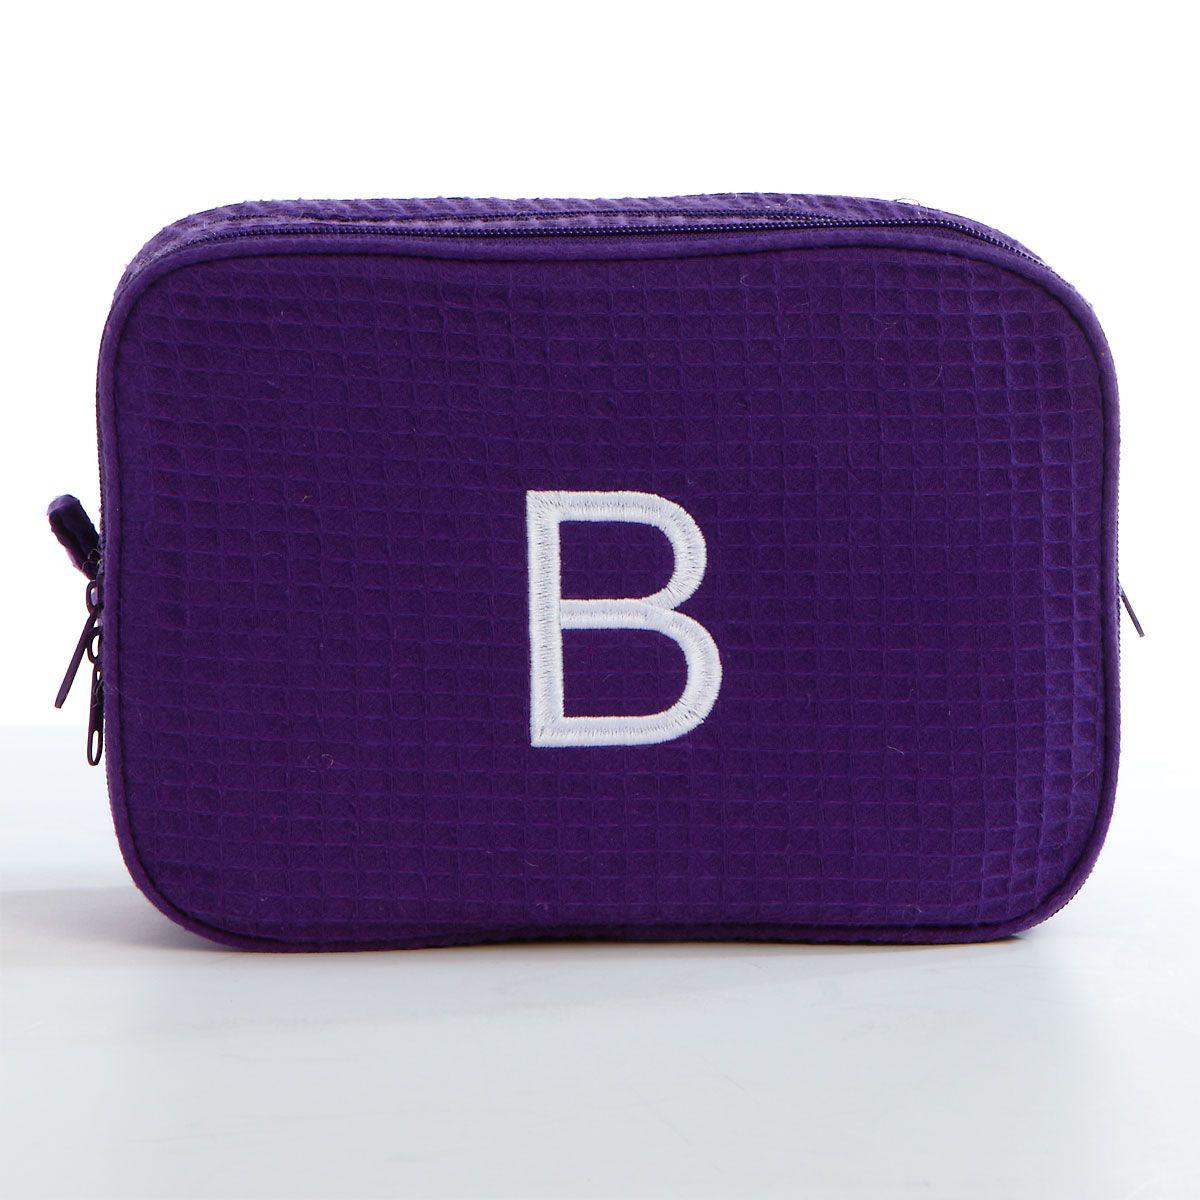 Waffle Weave Cosmetic Bag-Purple-815639C